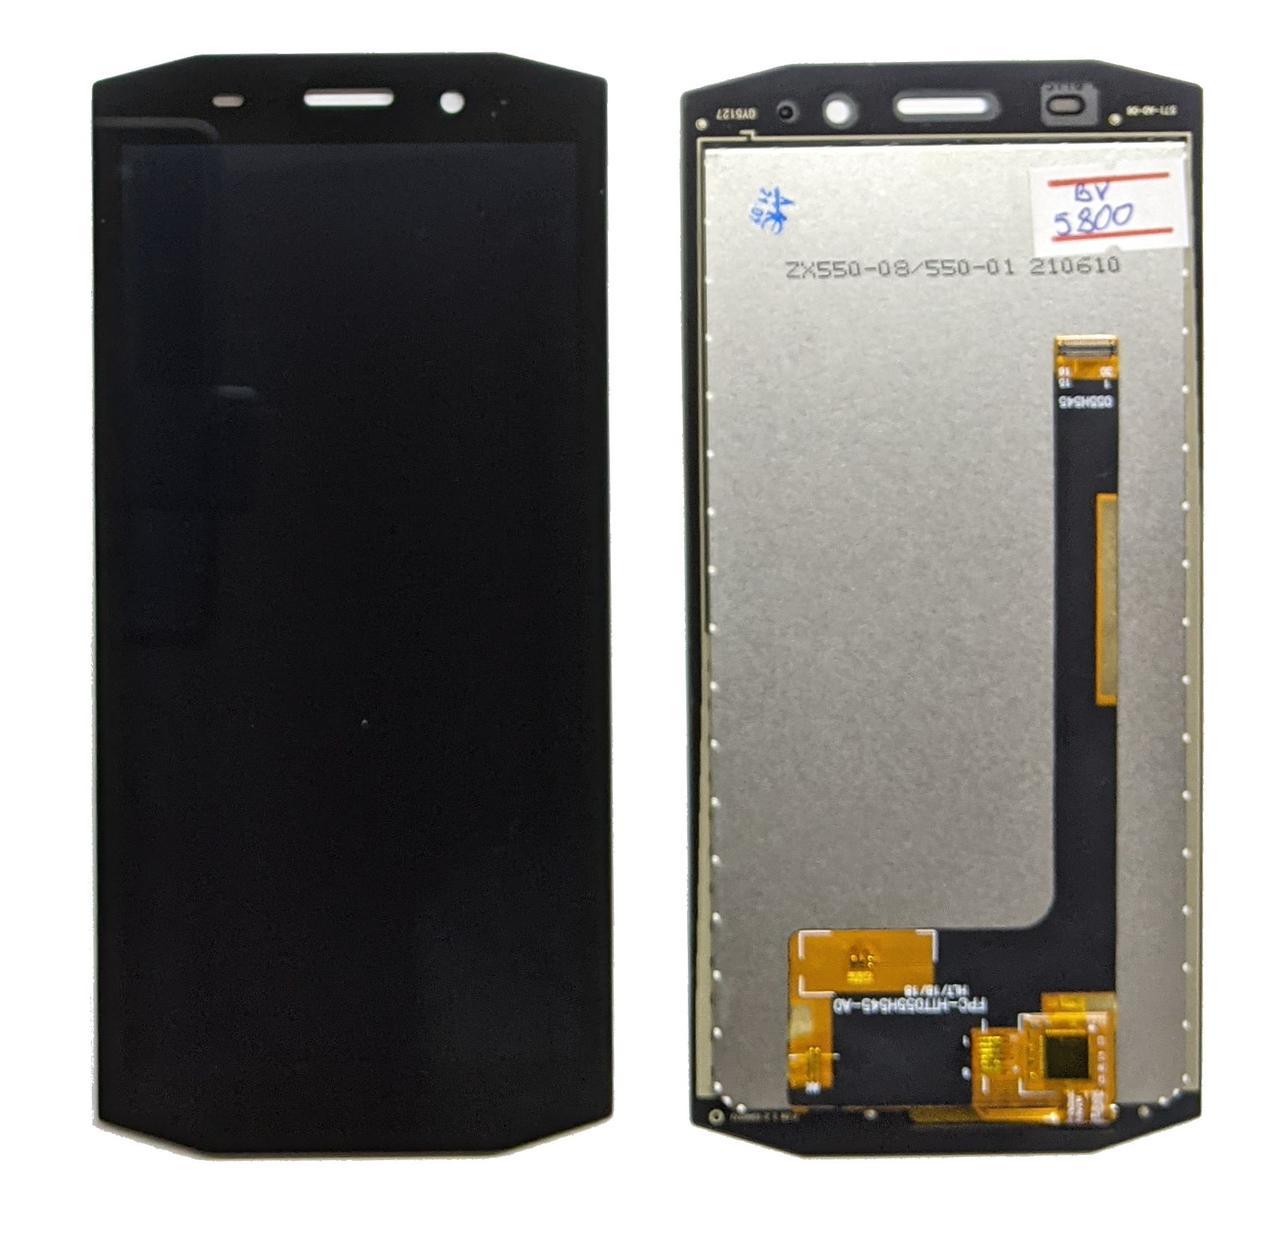 Дисплейный модуль Blackview BV5800 / BV5800 pro тачскрин и дисплей